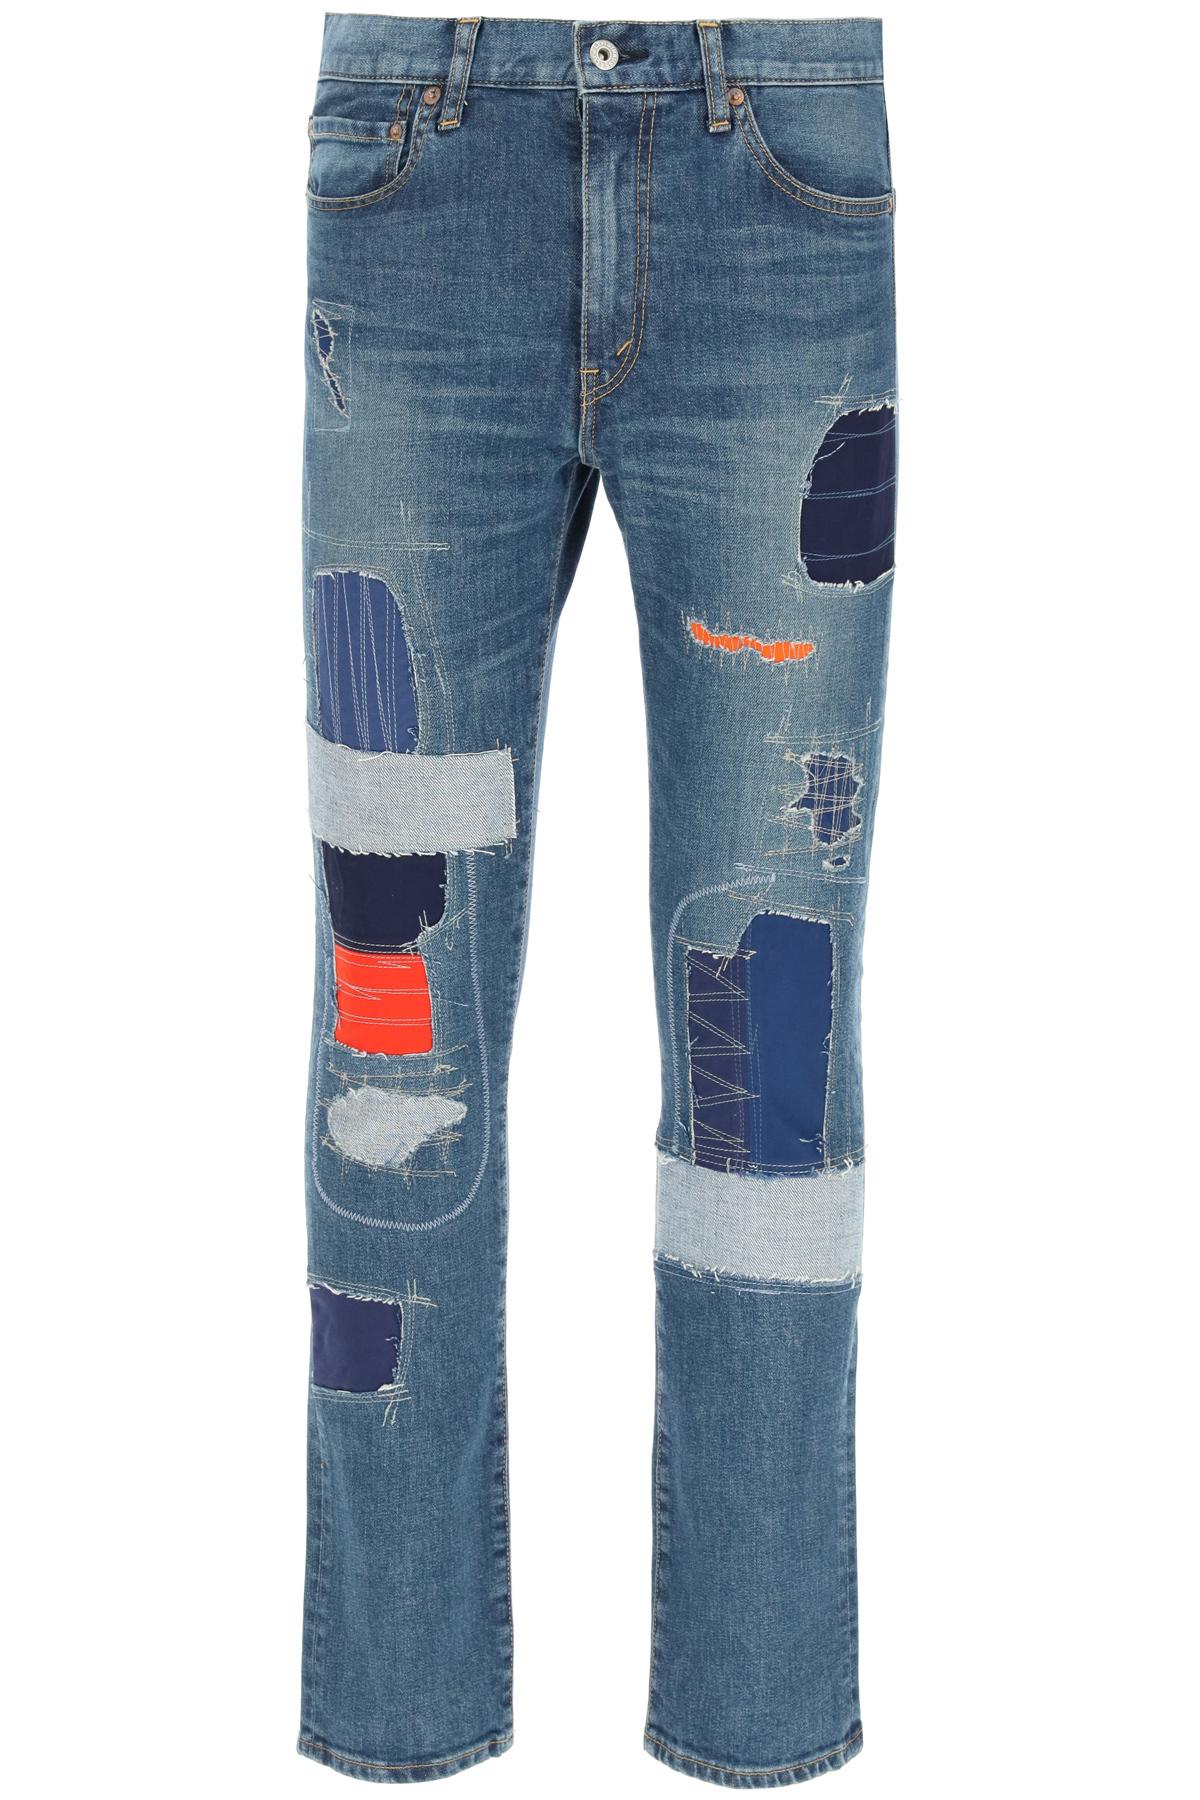 Junya watanabe jeans levi's patchwork